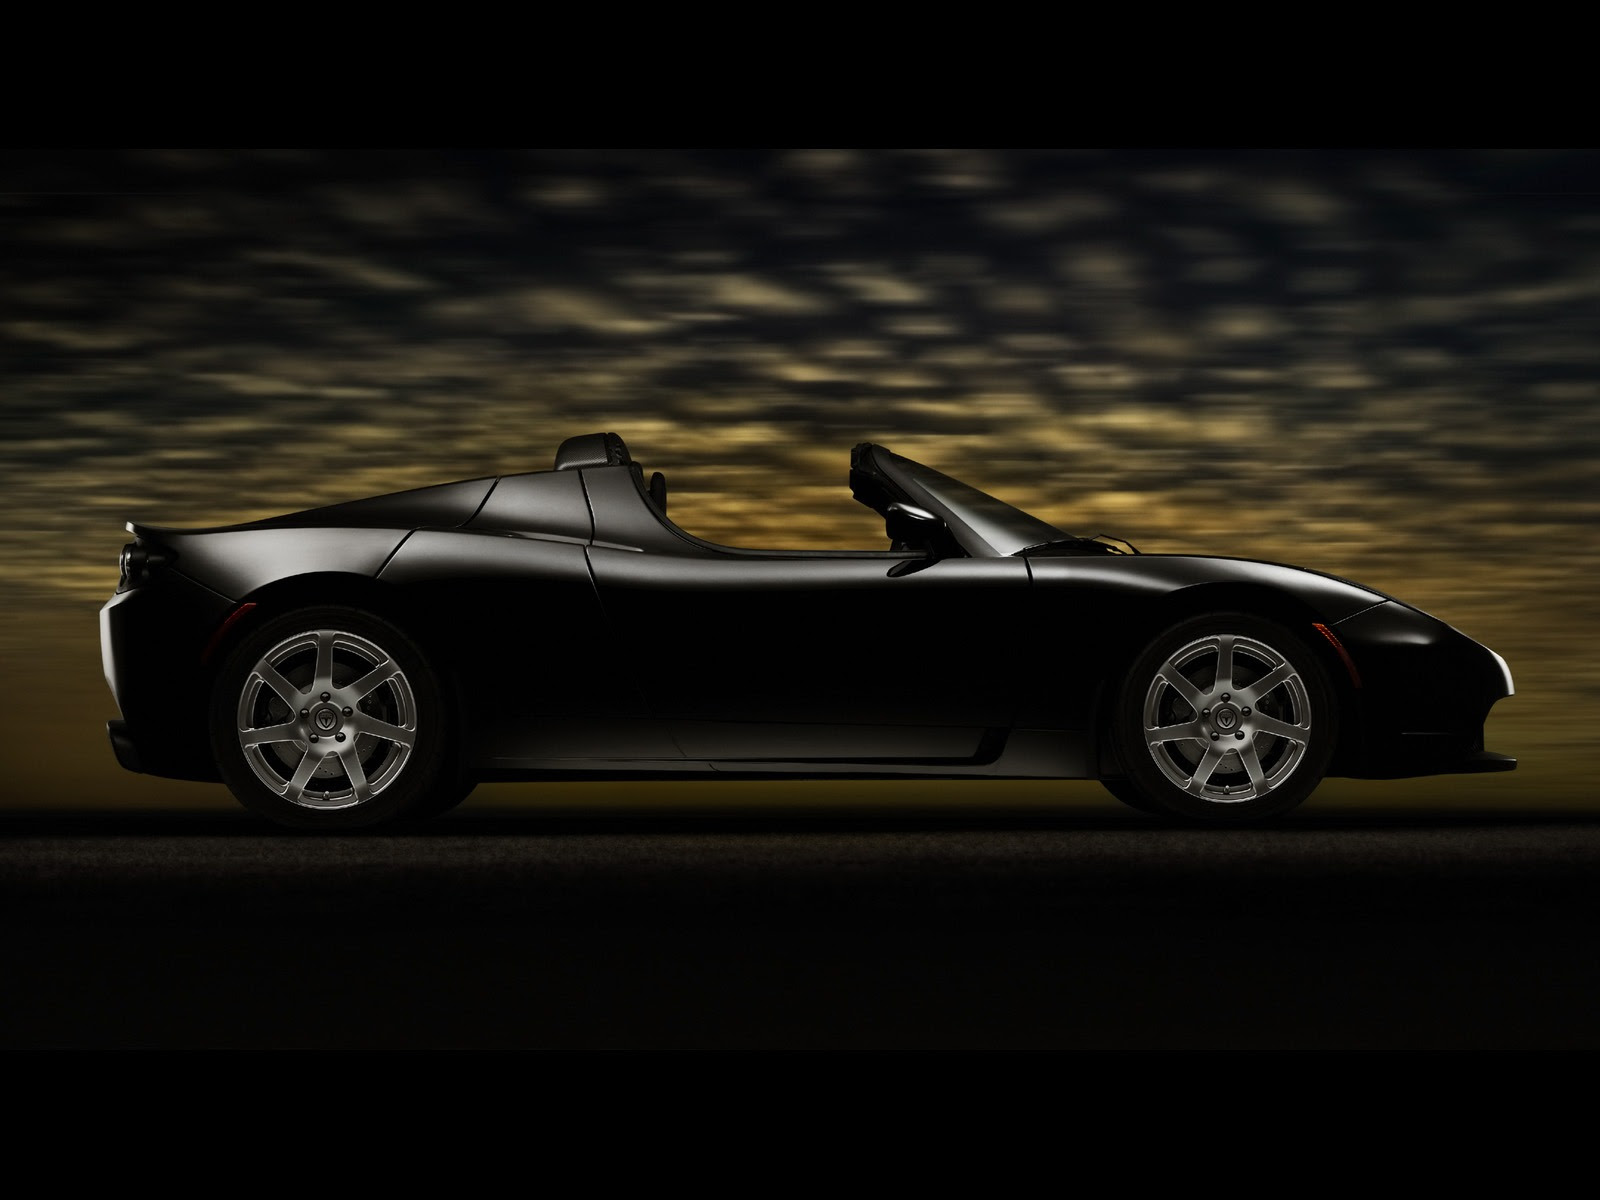 Tesla Roadster Black Wallpaper Tesla Cars Wallpapers In Jpg Format For Free Download